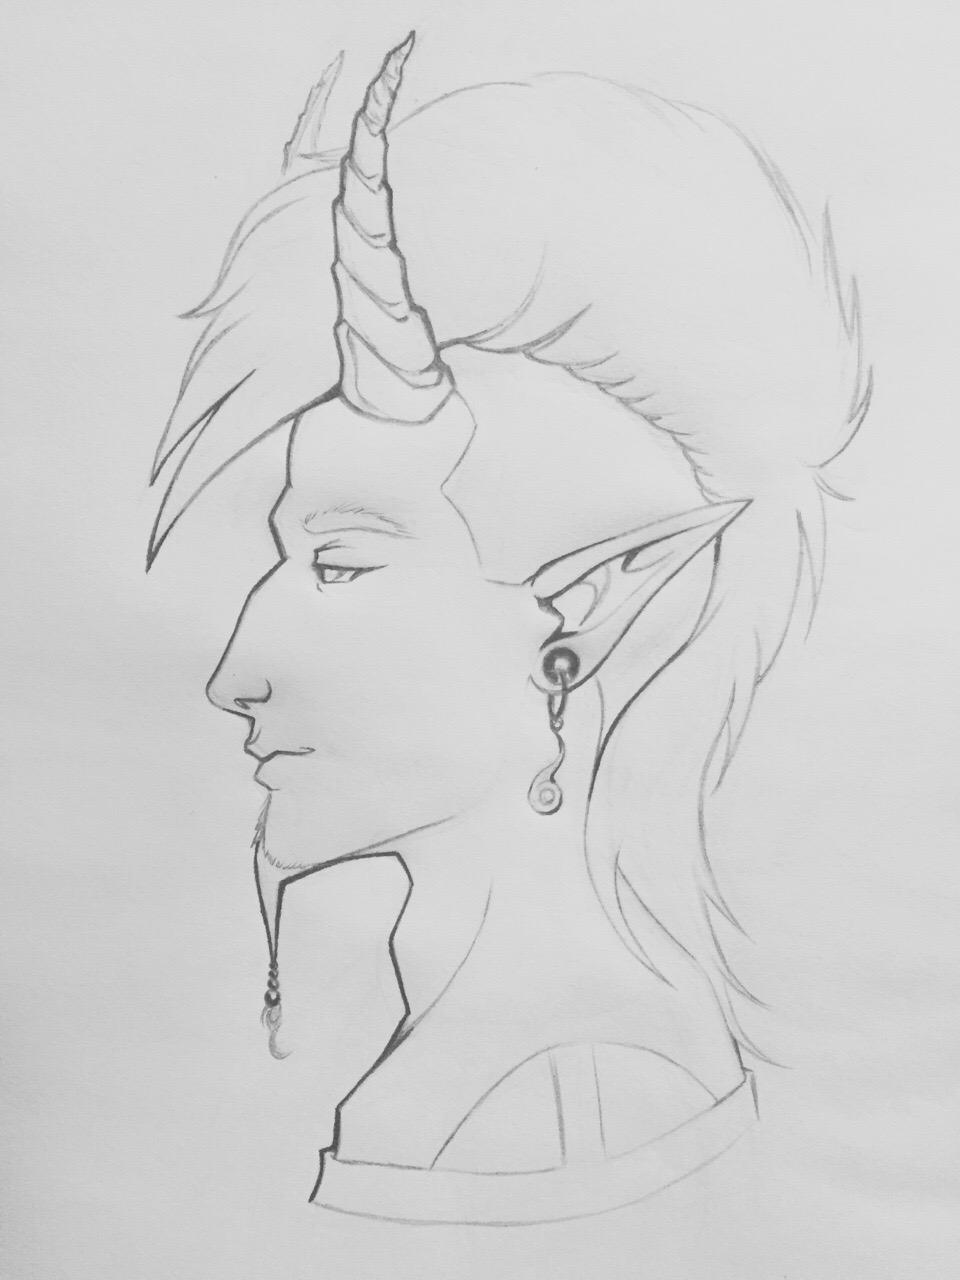 Faust Lineart by dms_cheeseshirted_chorusneko